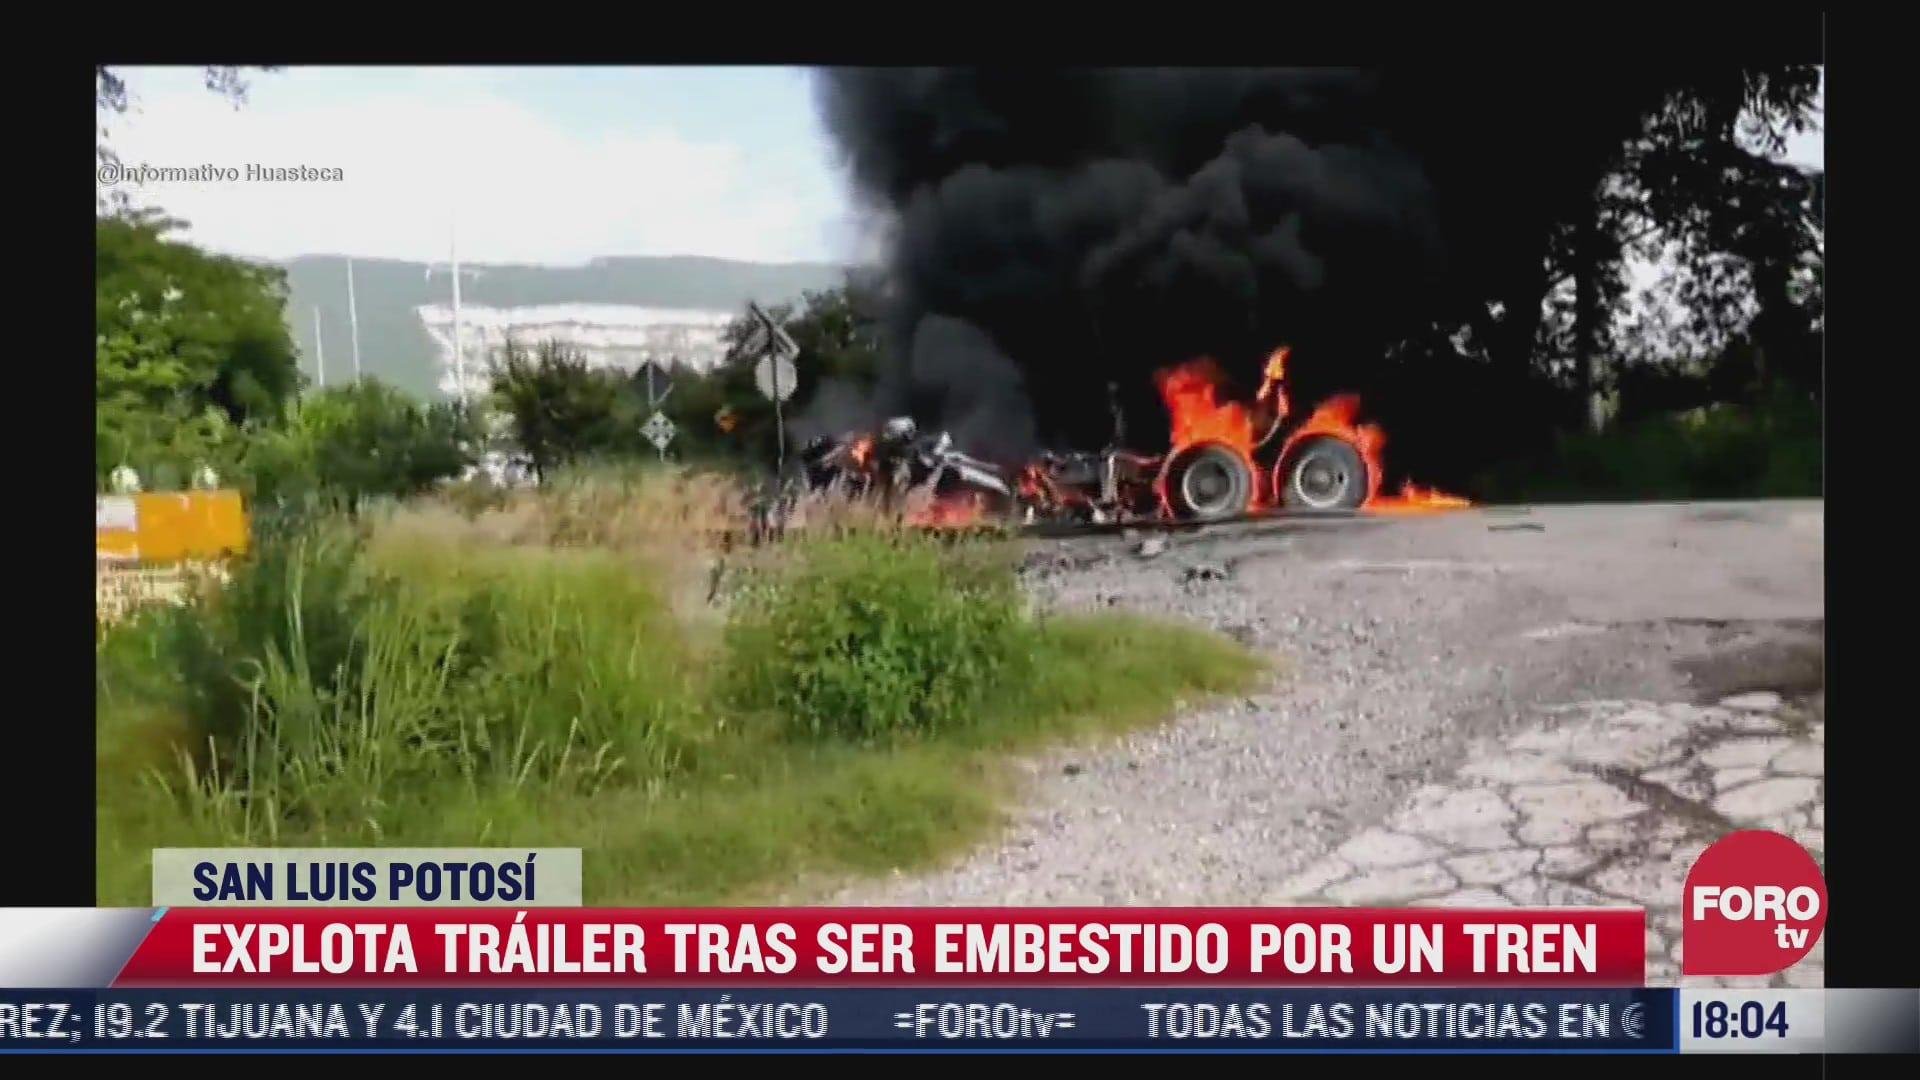 explota trailer tras ser embestido por tren en slp